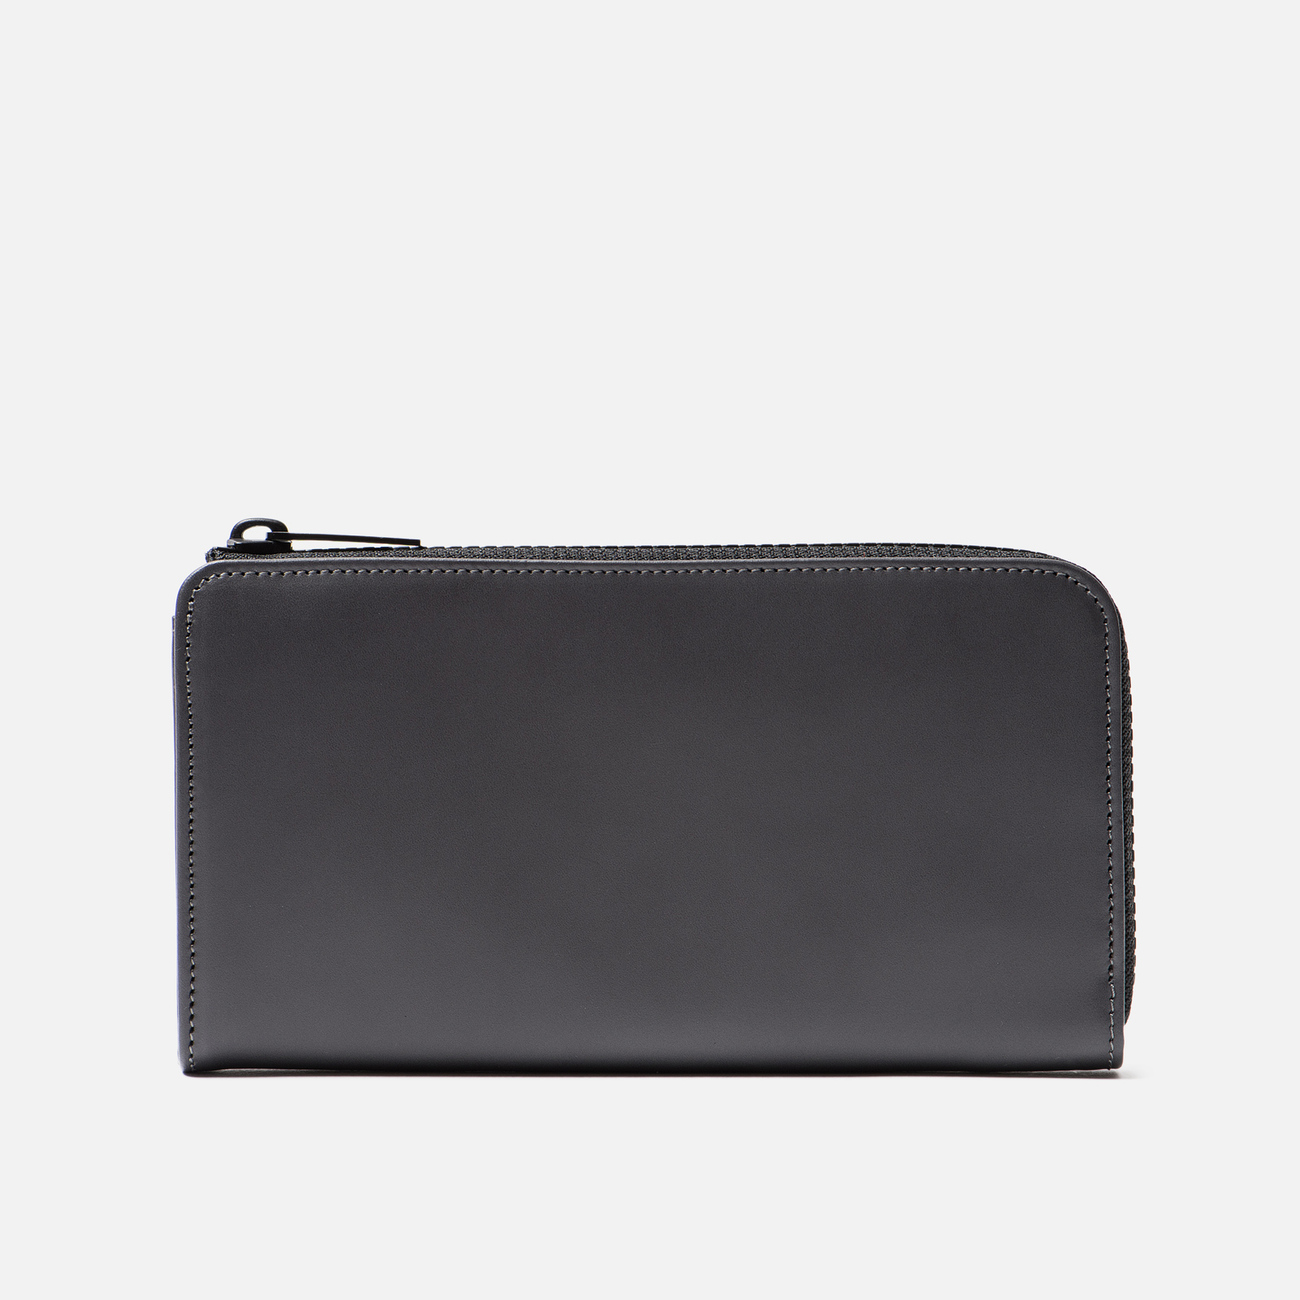 Кошелек Maison Margiela 11 Leather Long Zip Castlerock